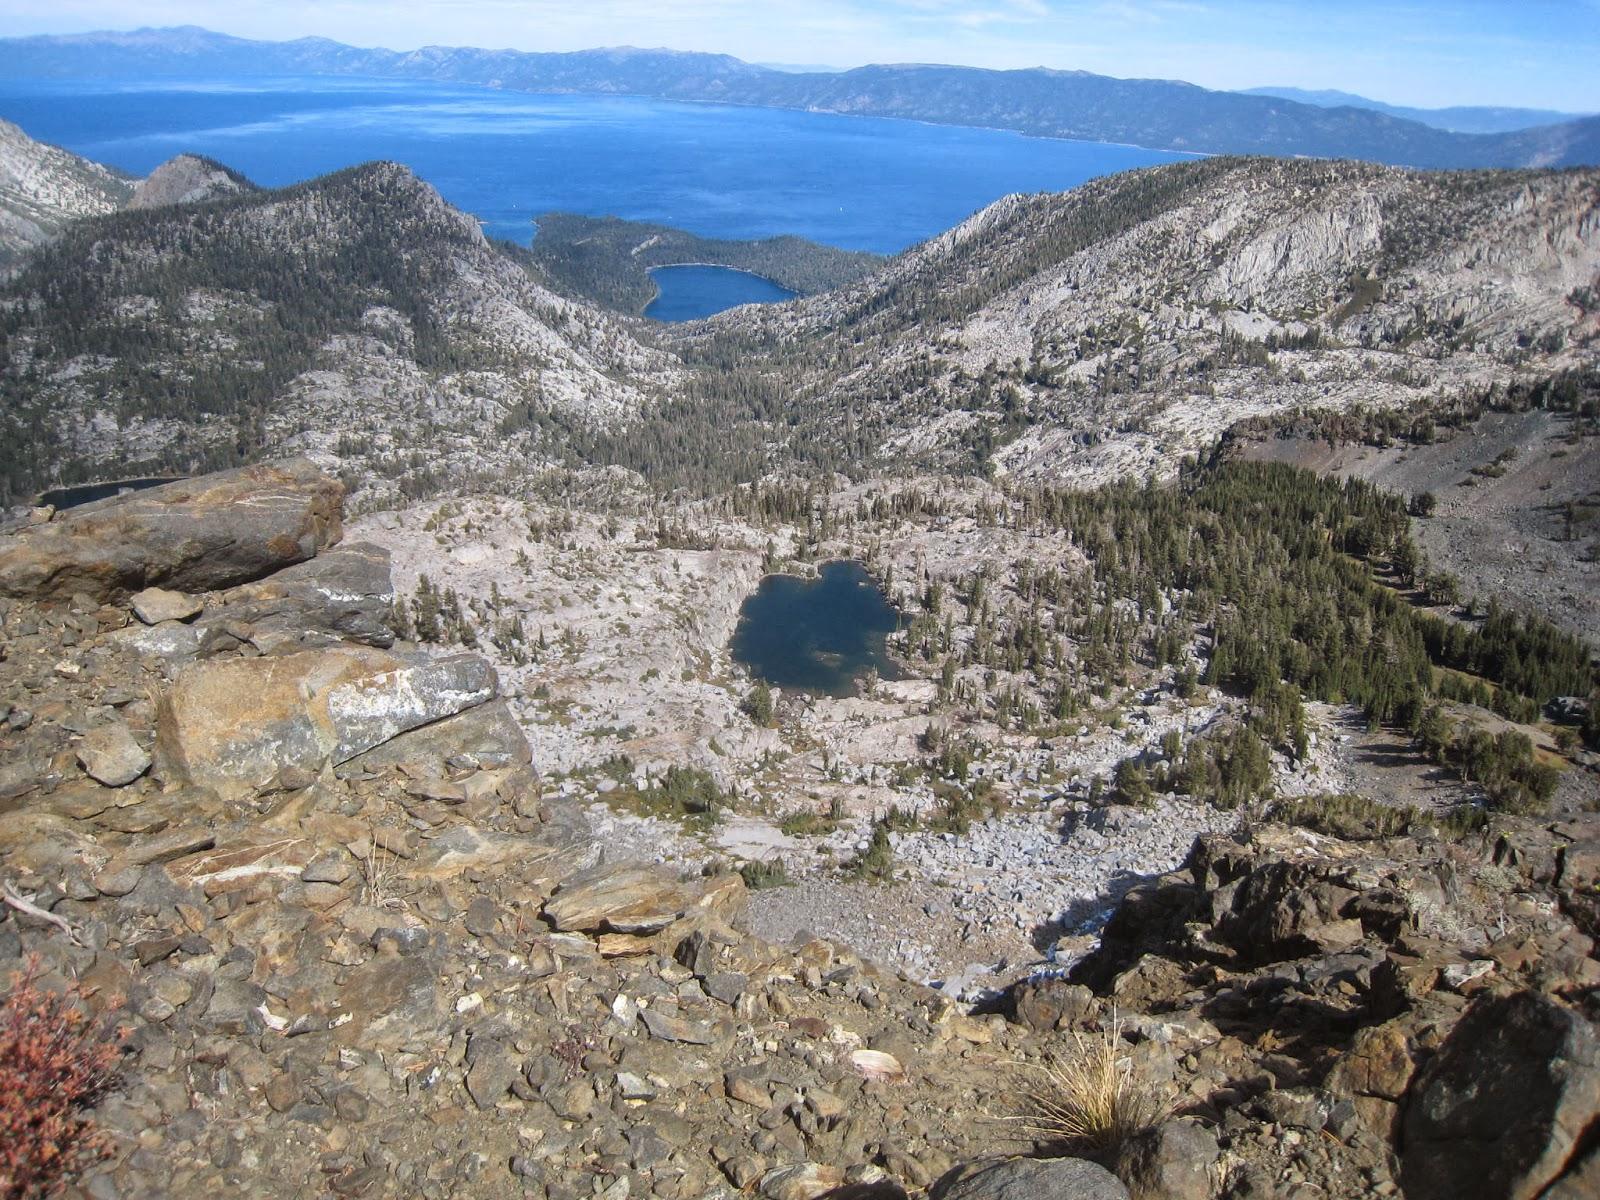 desolation wilderness sierra nevada s hiking paradise above lake tahoe